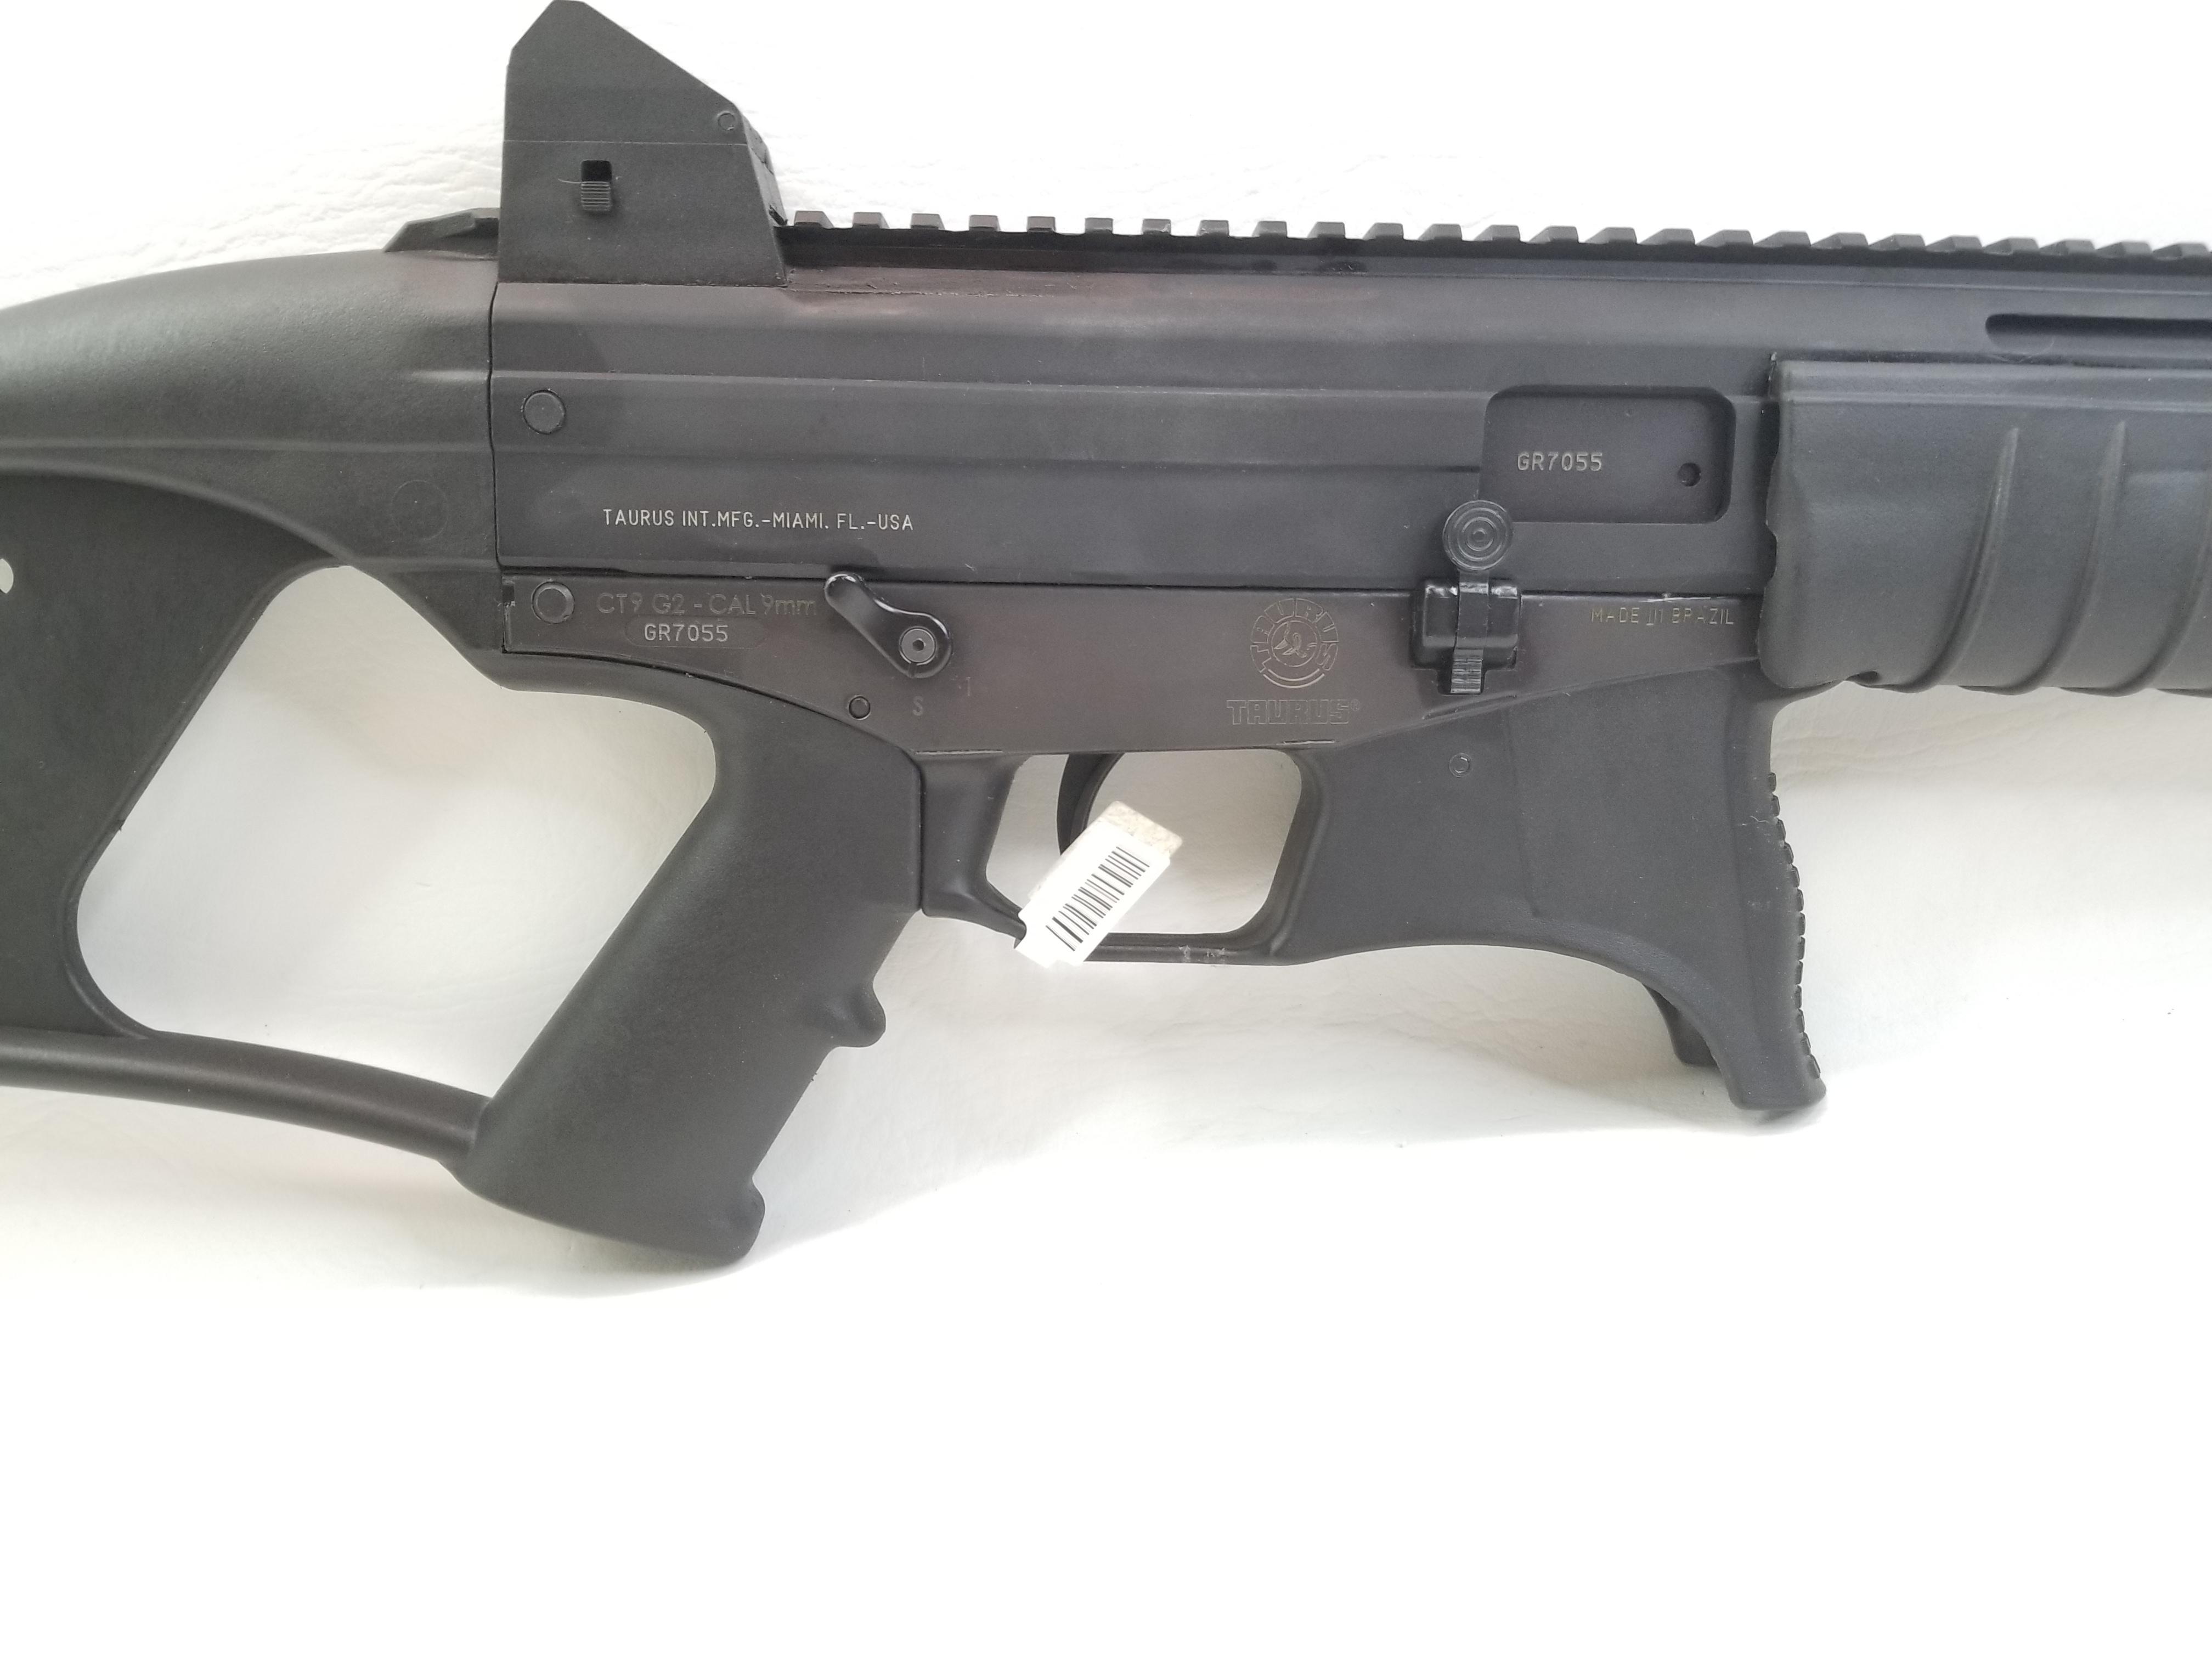 Taurus Bolt Action Rifle Model CT9G2 9mm-img-7